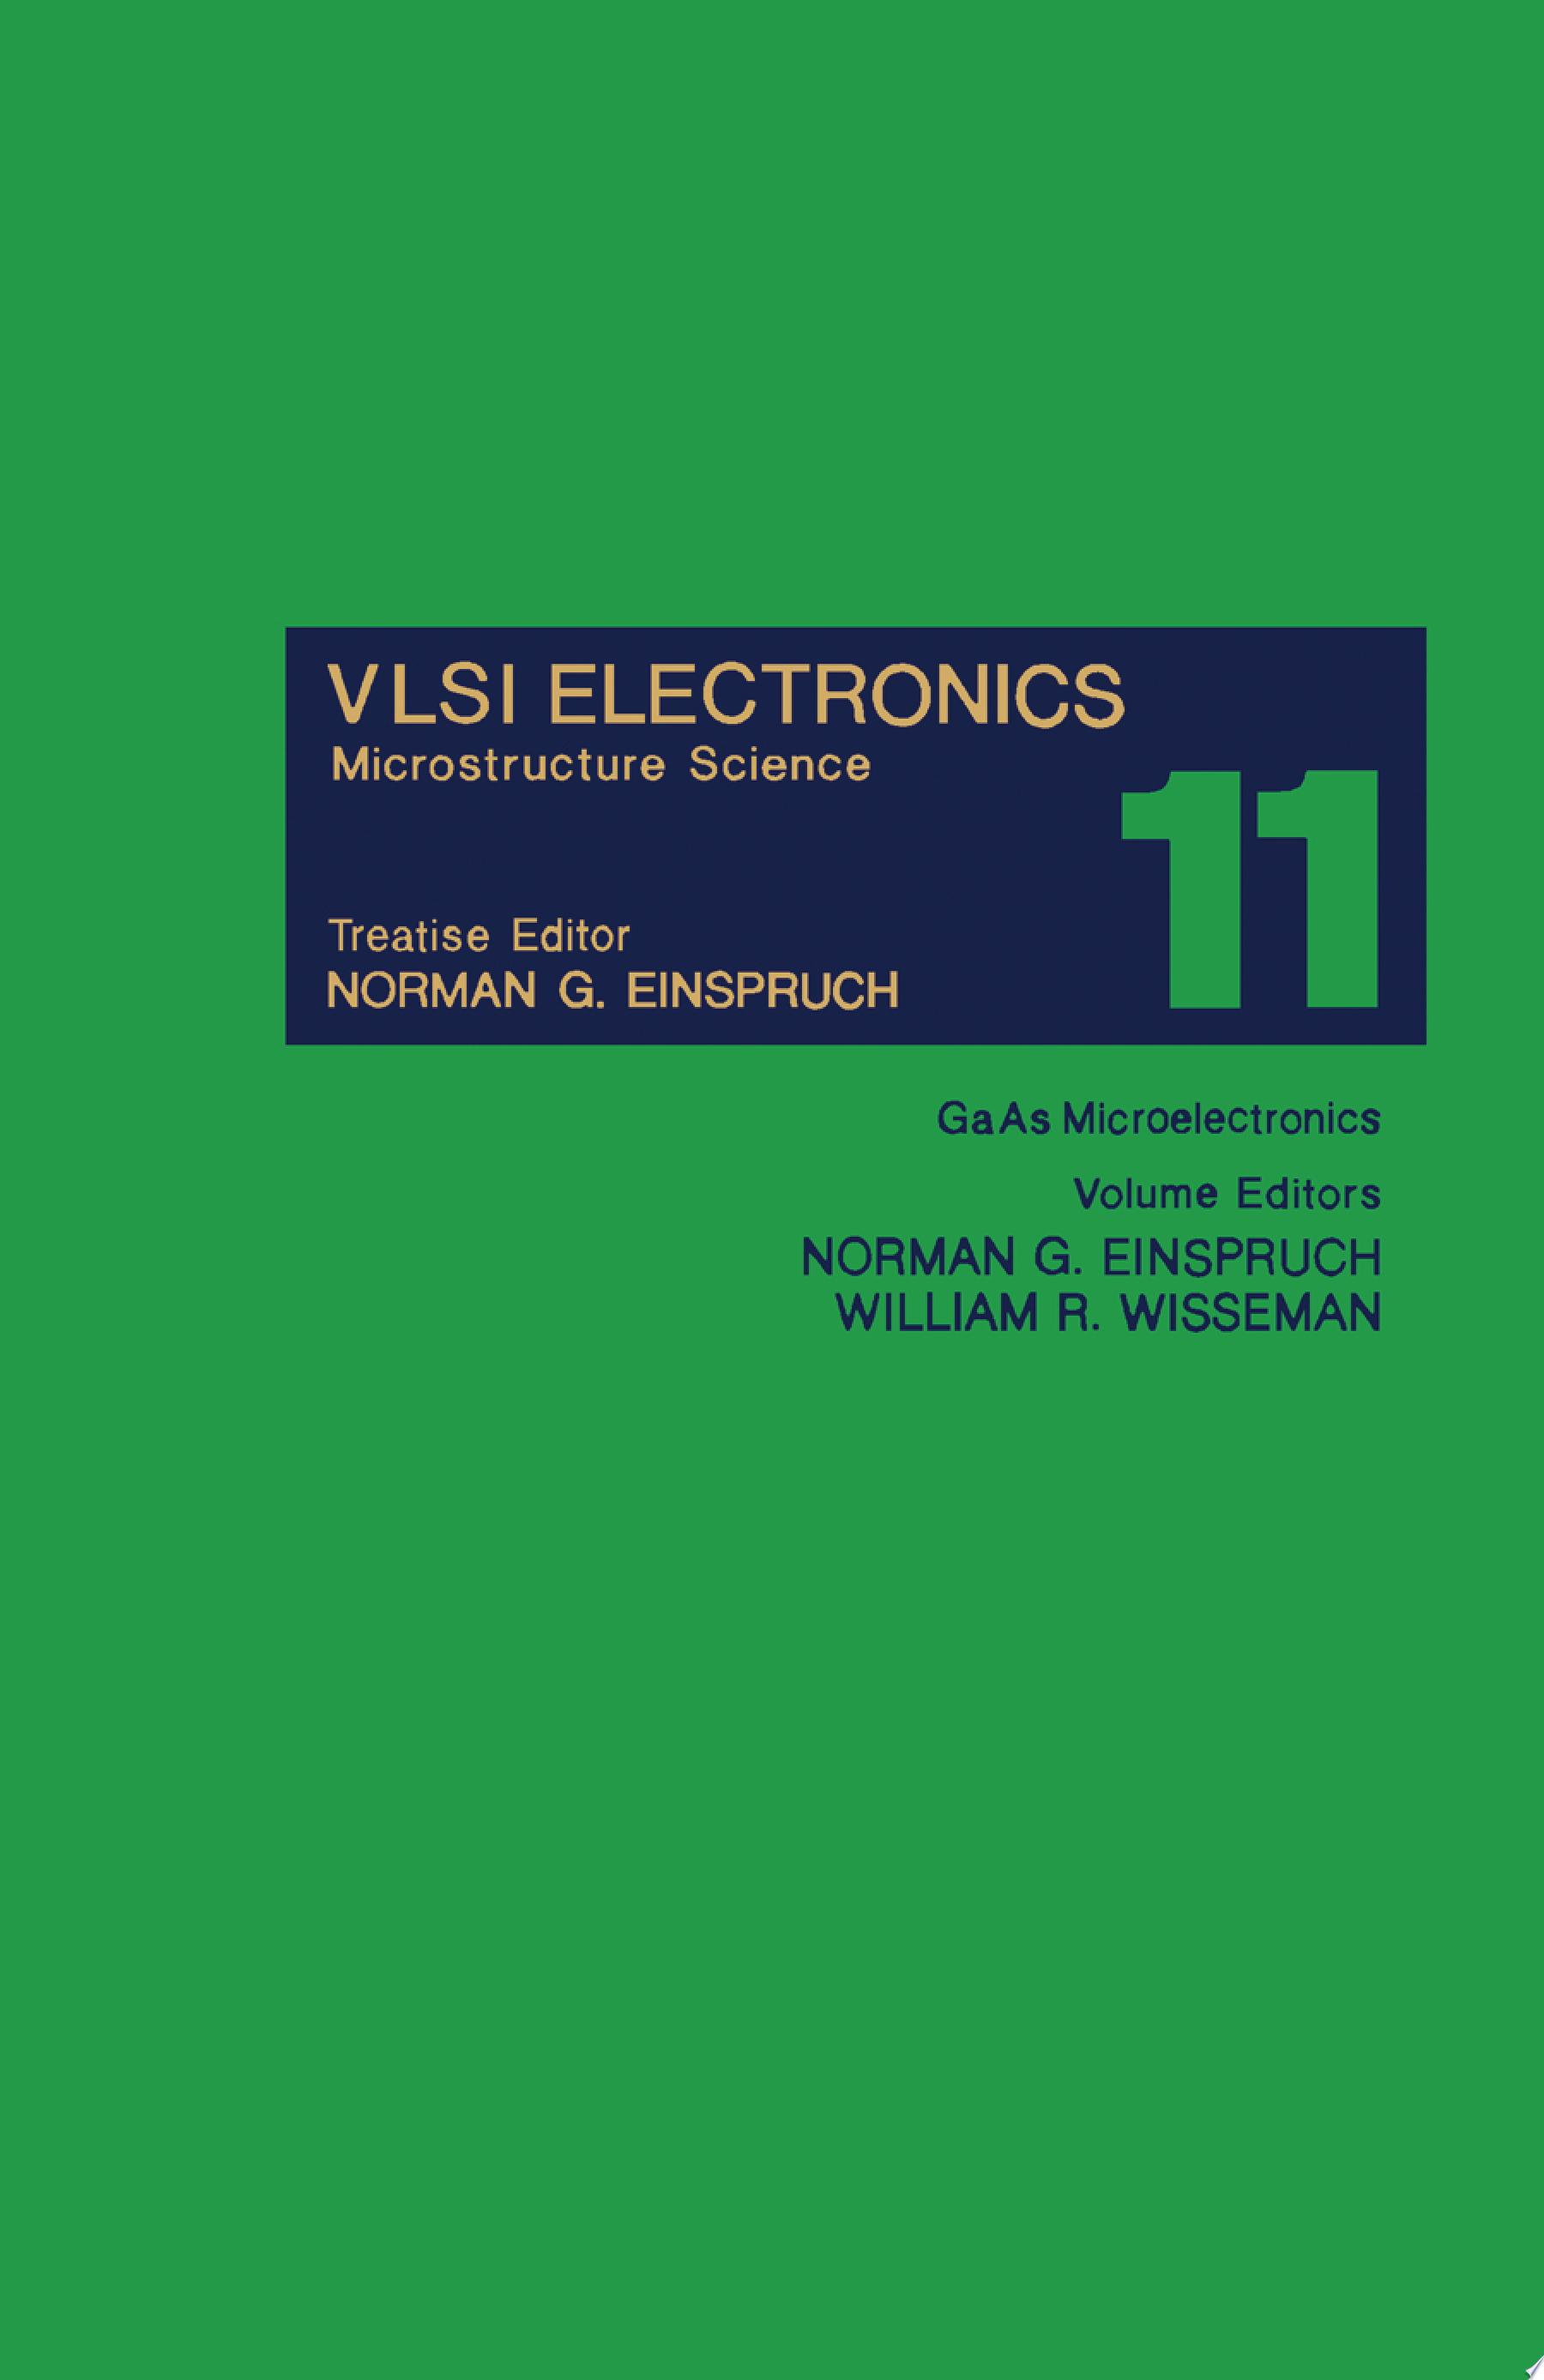 GaAs Microelectronics